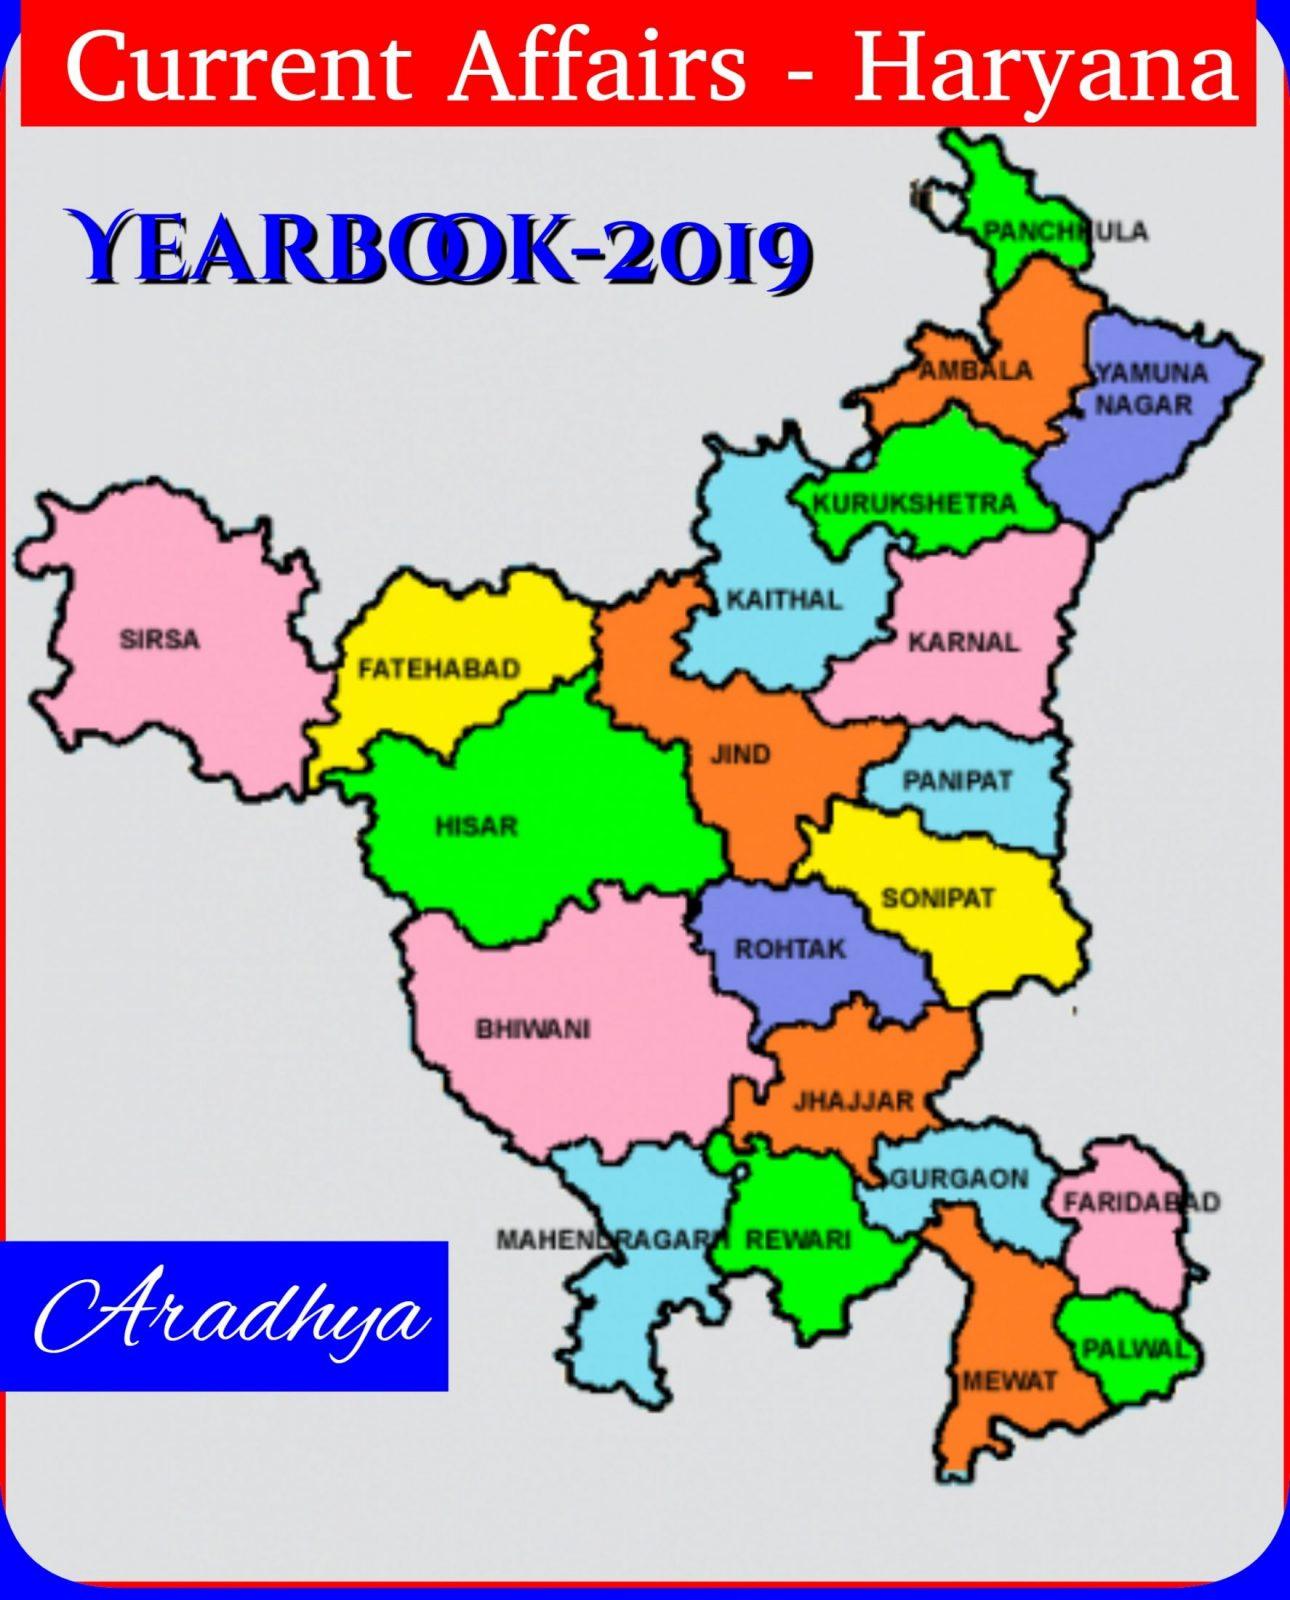 Haryana Current Affairs Yearbook 2019-20 Updated